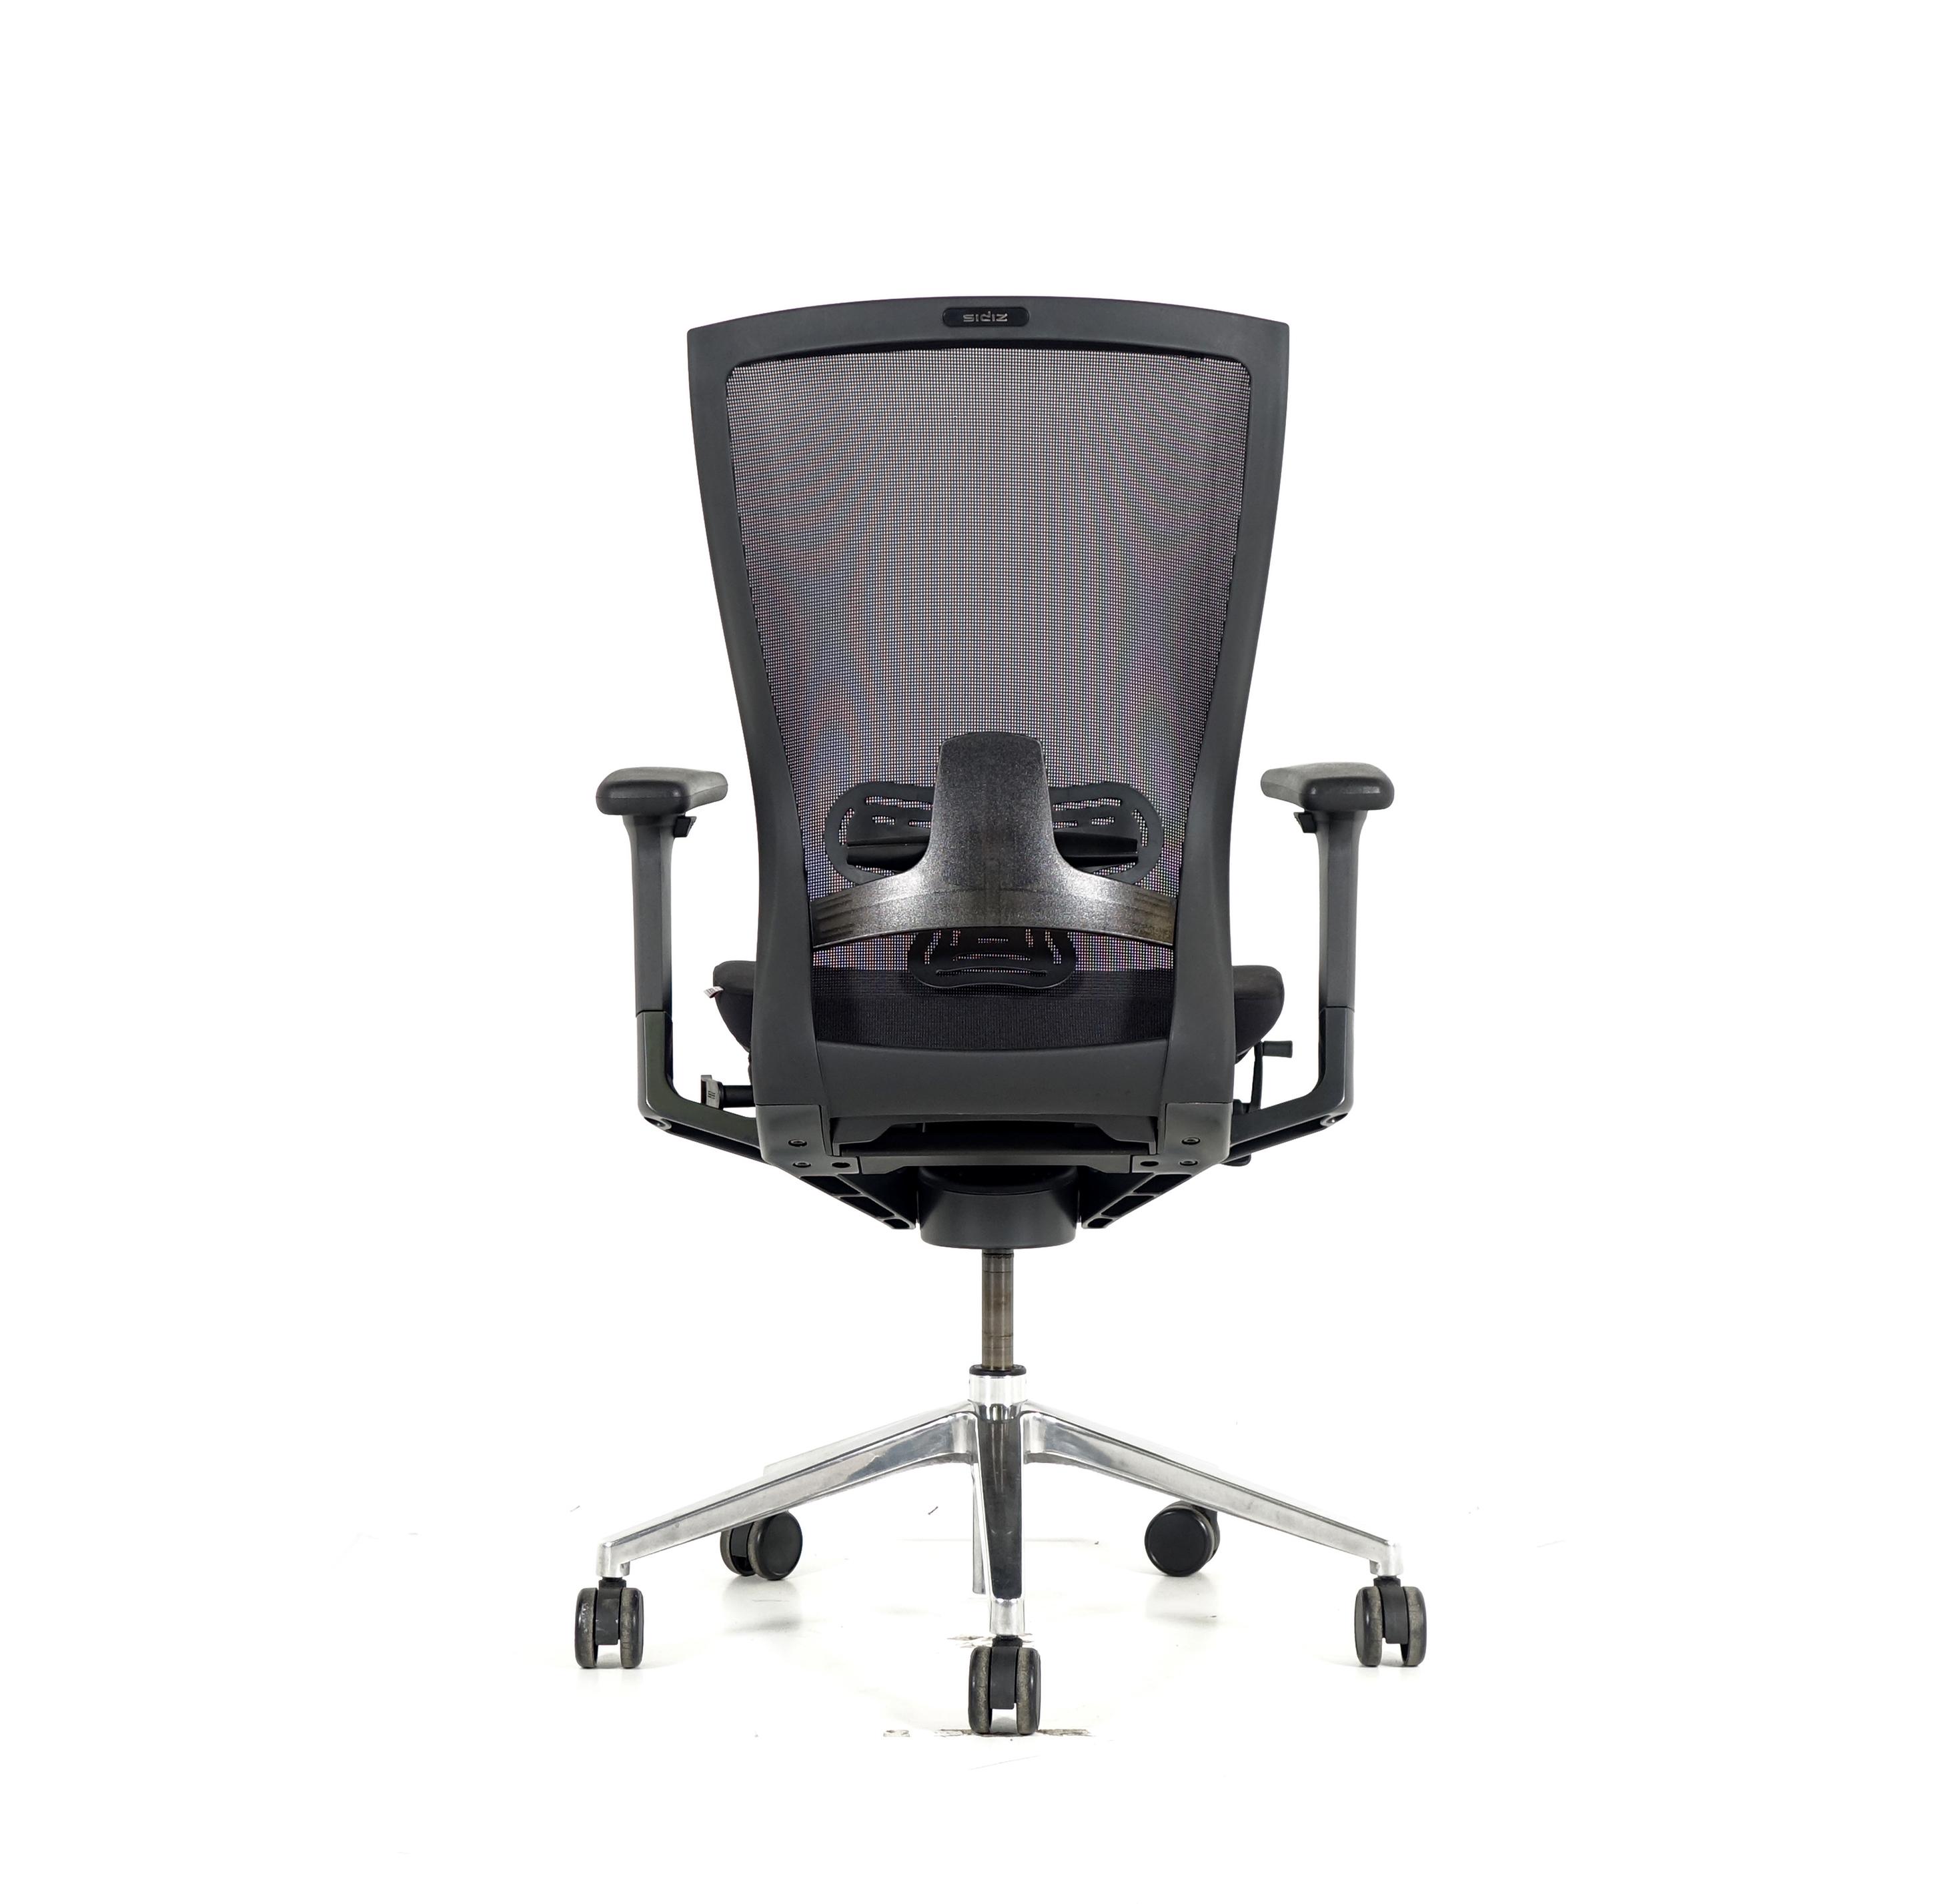 T50 Mesh Office Chair Rear